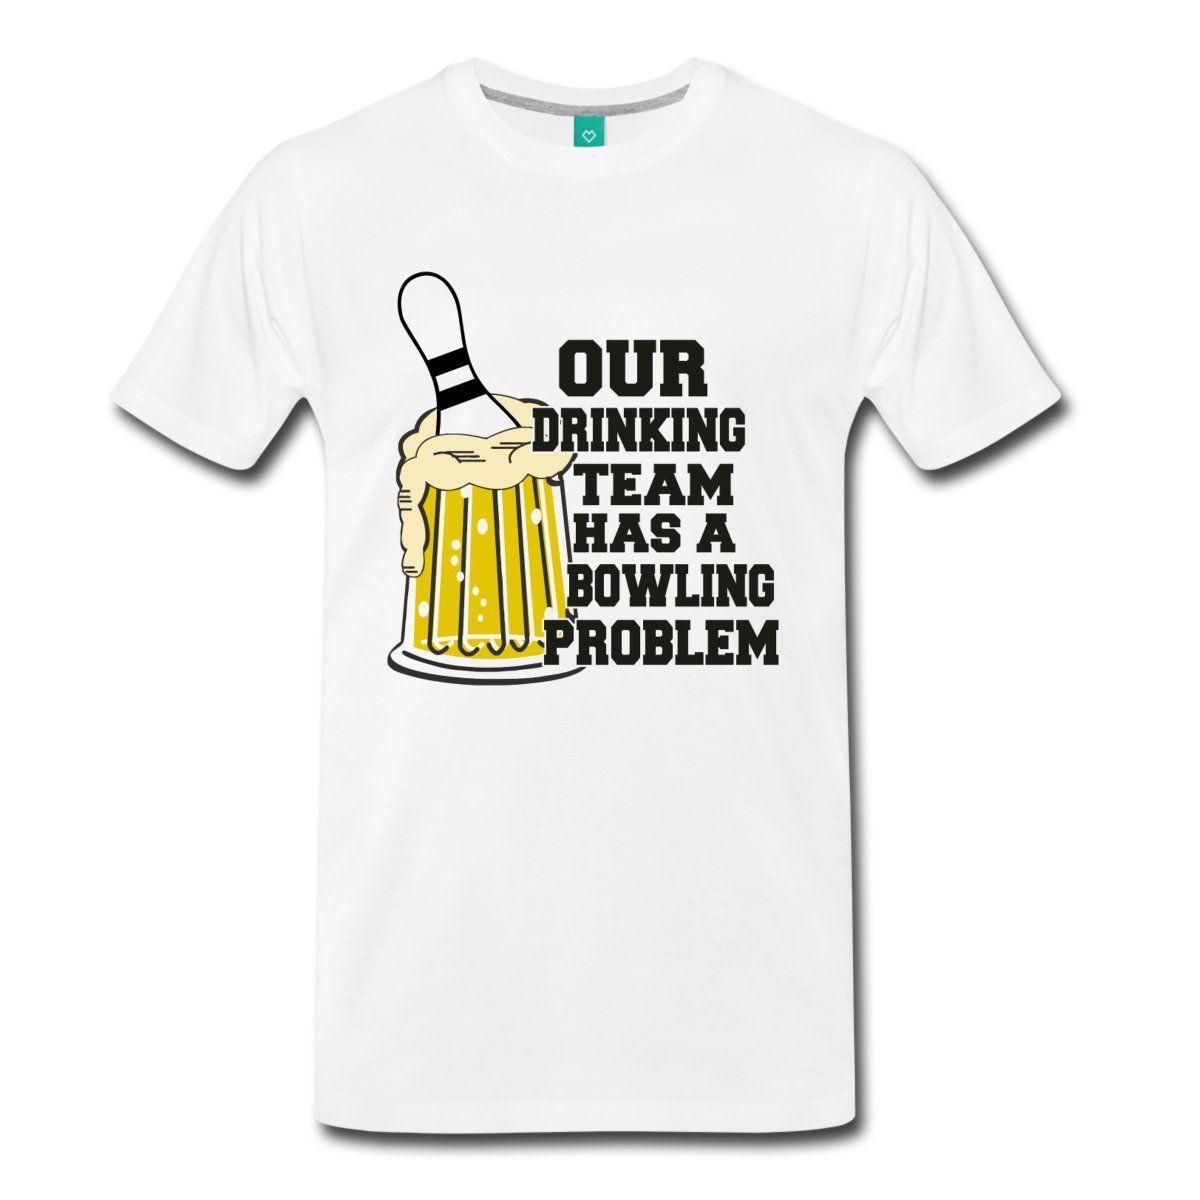 c0c73ecc Bowlinger Quote Drinking Team With Bowlinger Problem Men's T-shirt New  Fashion Mens Short Sleeve Tshirt Cotton T Shirts